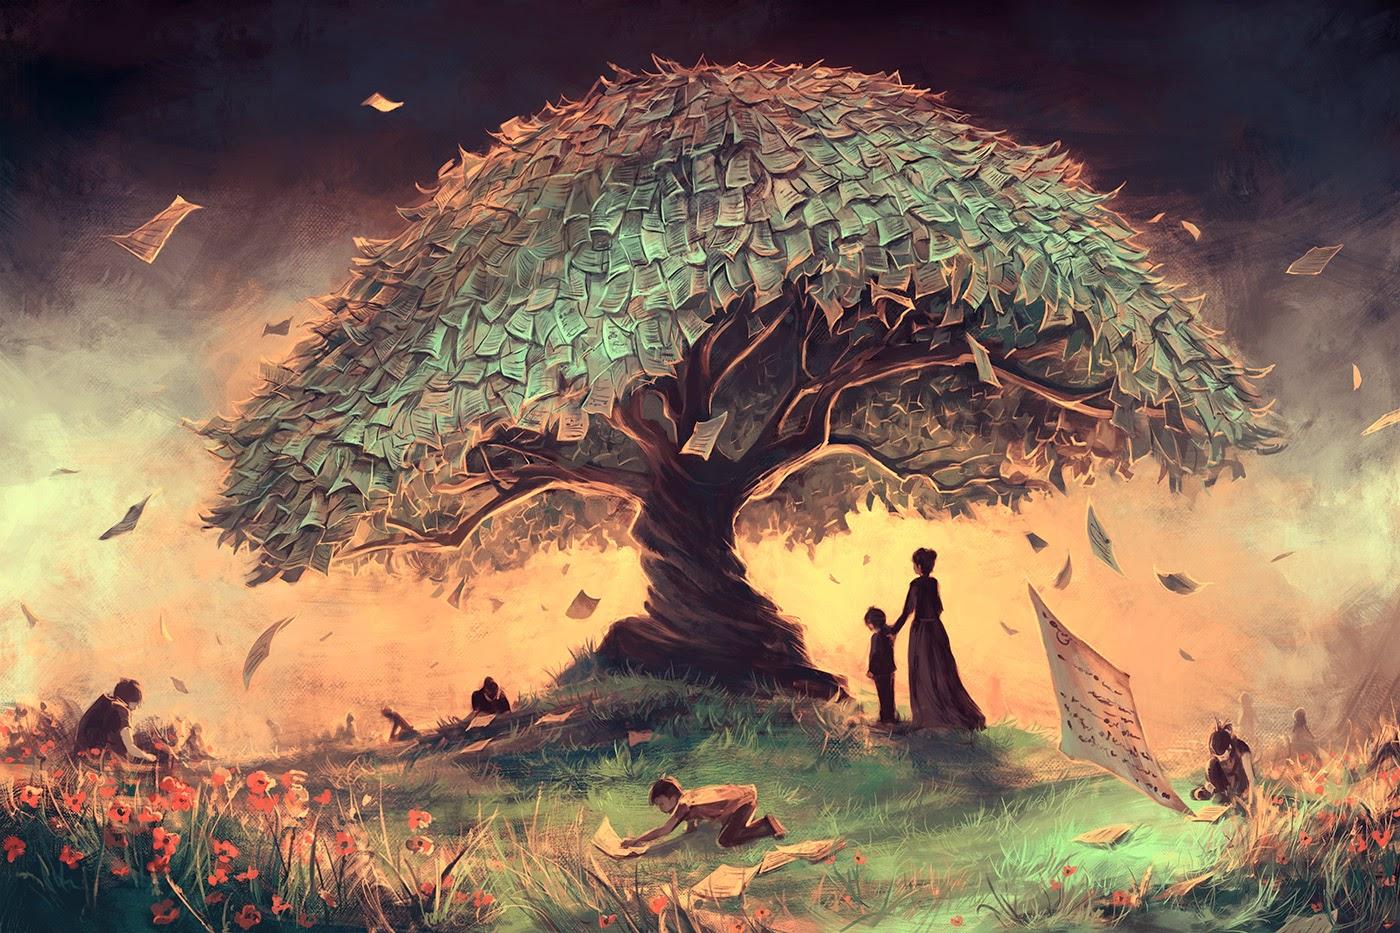 06-Follow-Our-Rules-Rolando-Cyril-aquasixio-Surreal-Fantasy-Otherworldly-Art-www-designstack-co